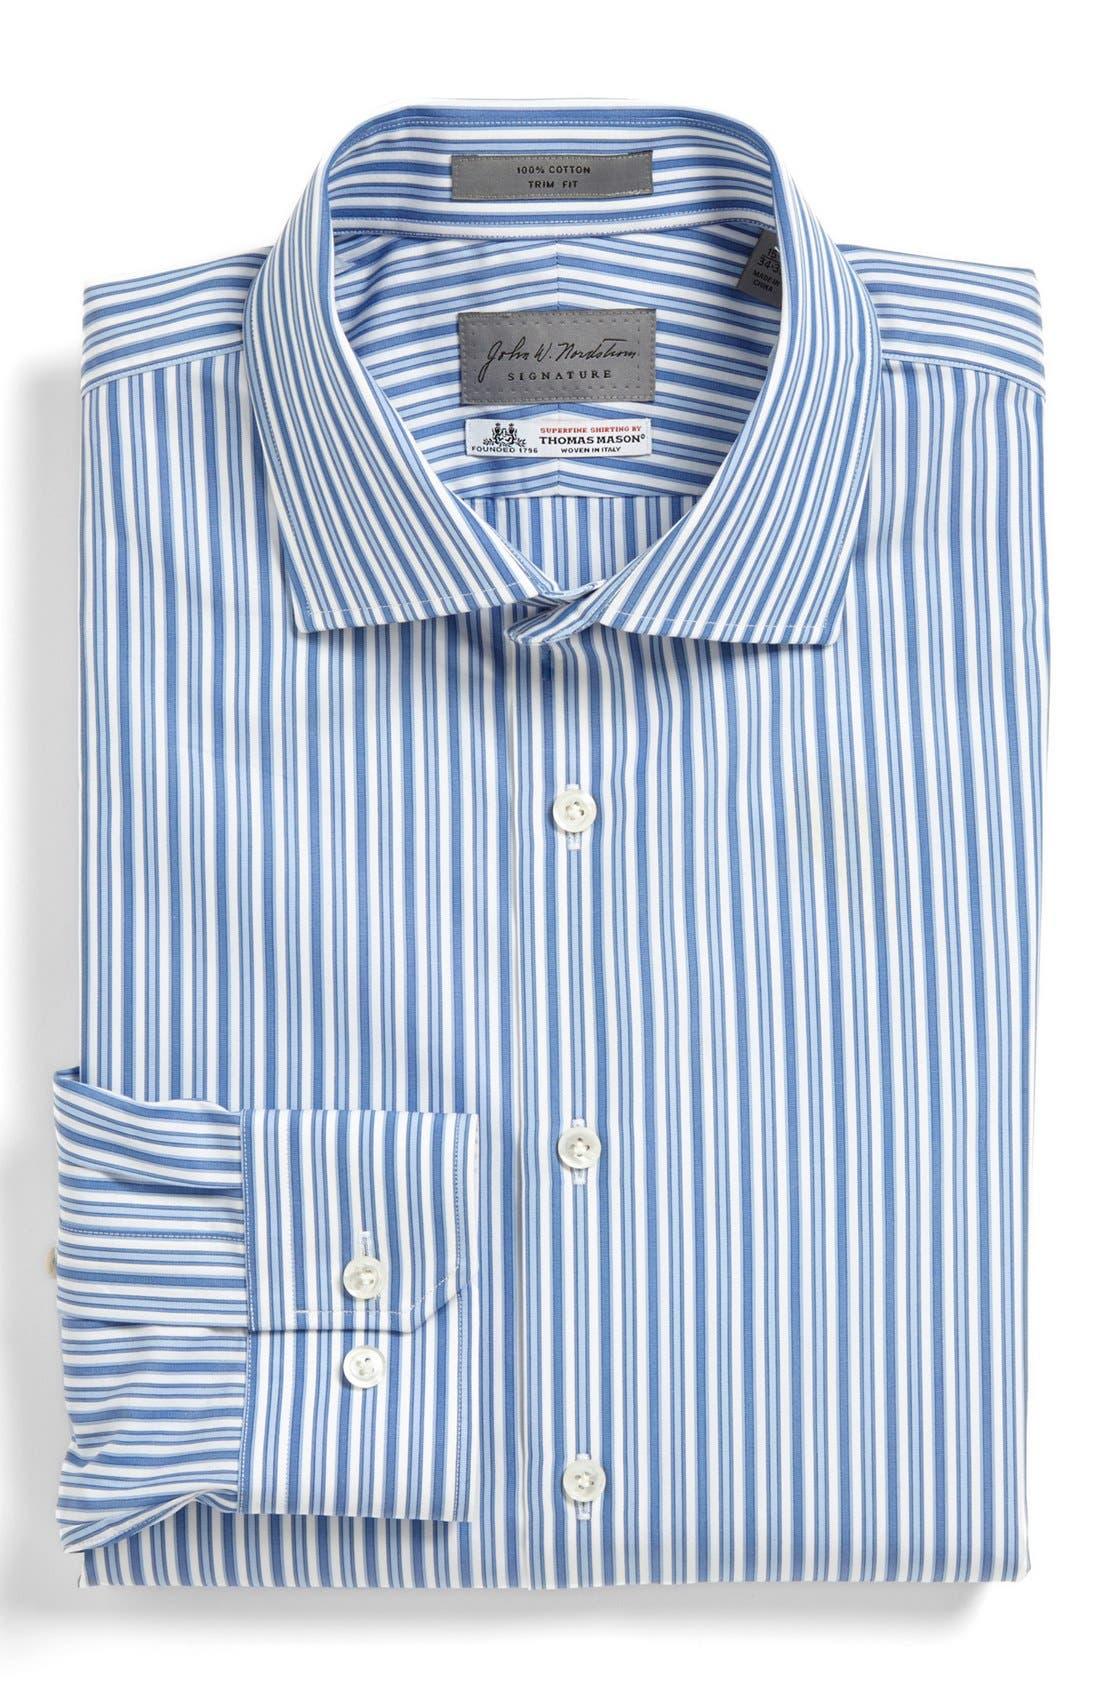 Alternate Image 1 Selected - John W. Nordstrom® Signature Trim Fit Stripe Dress Shirt